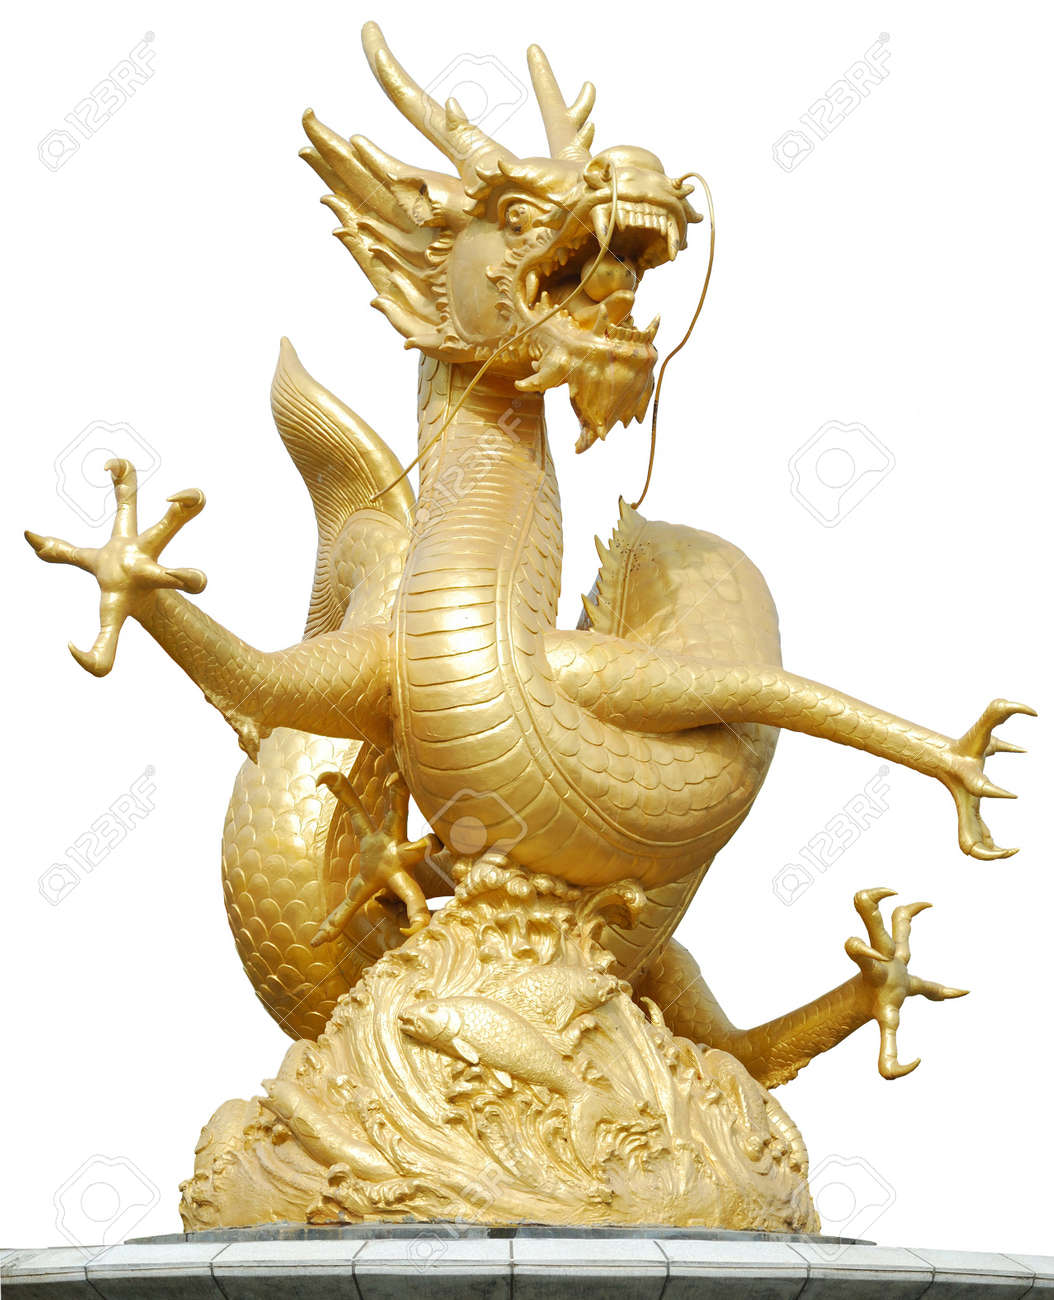 Gold Dragon Sculpture Figure Art China, Phuket Thailand Stock Photo - 7480758